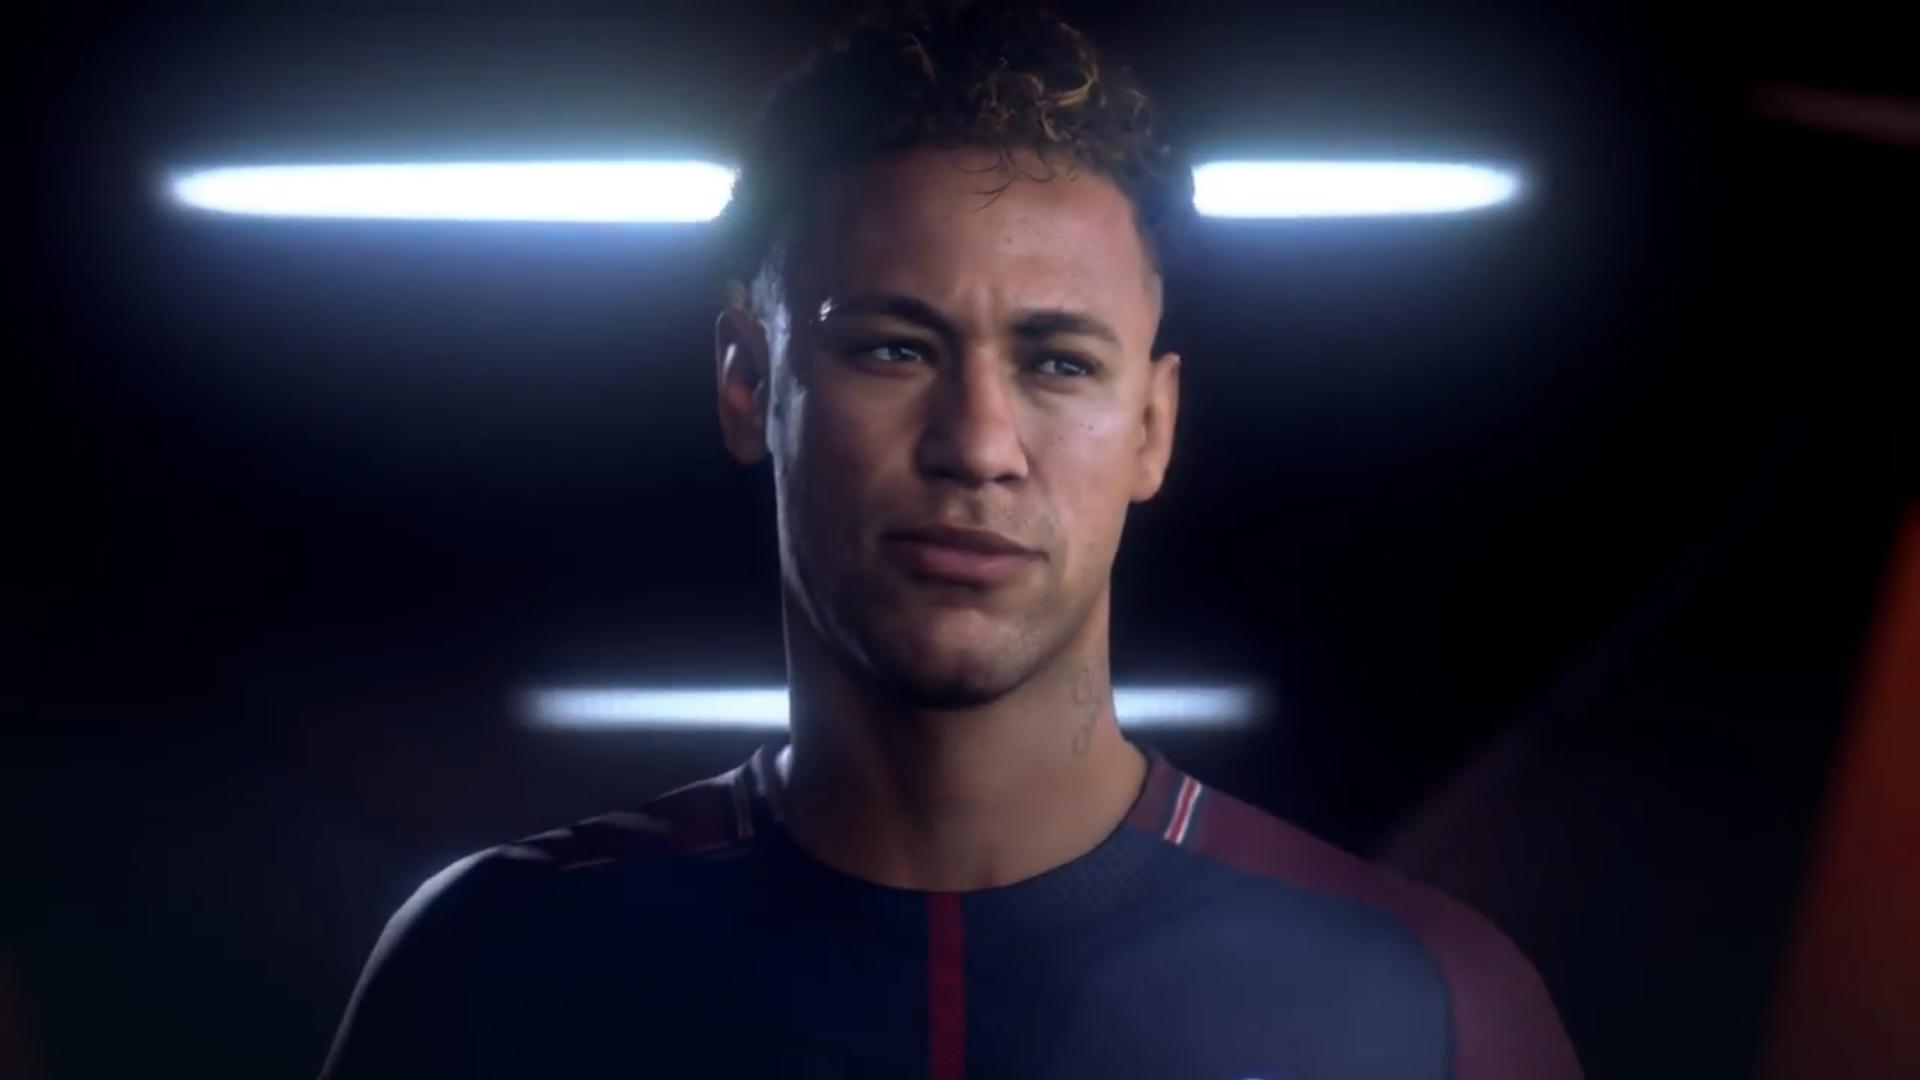 Neymar FIFA 19 game footage